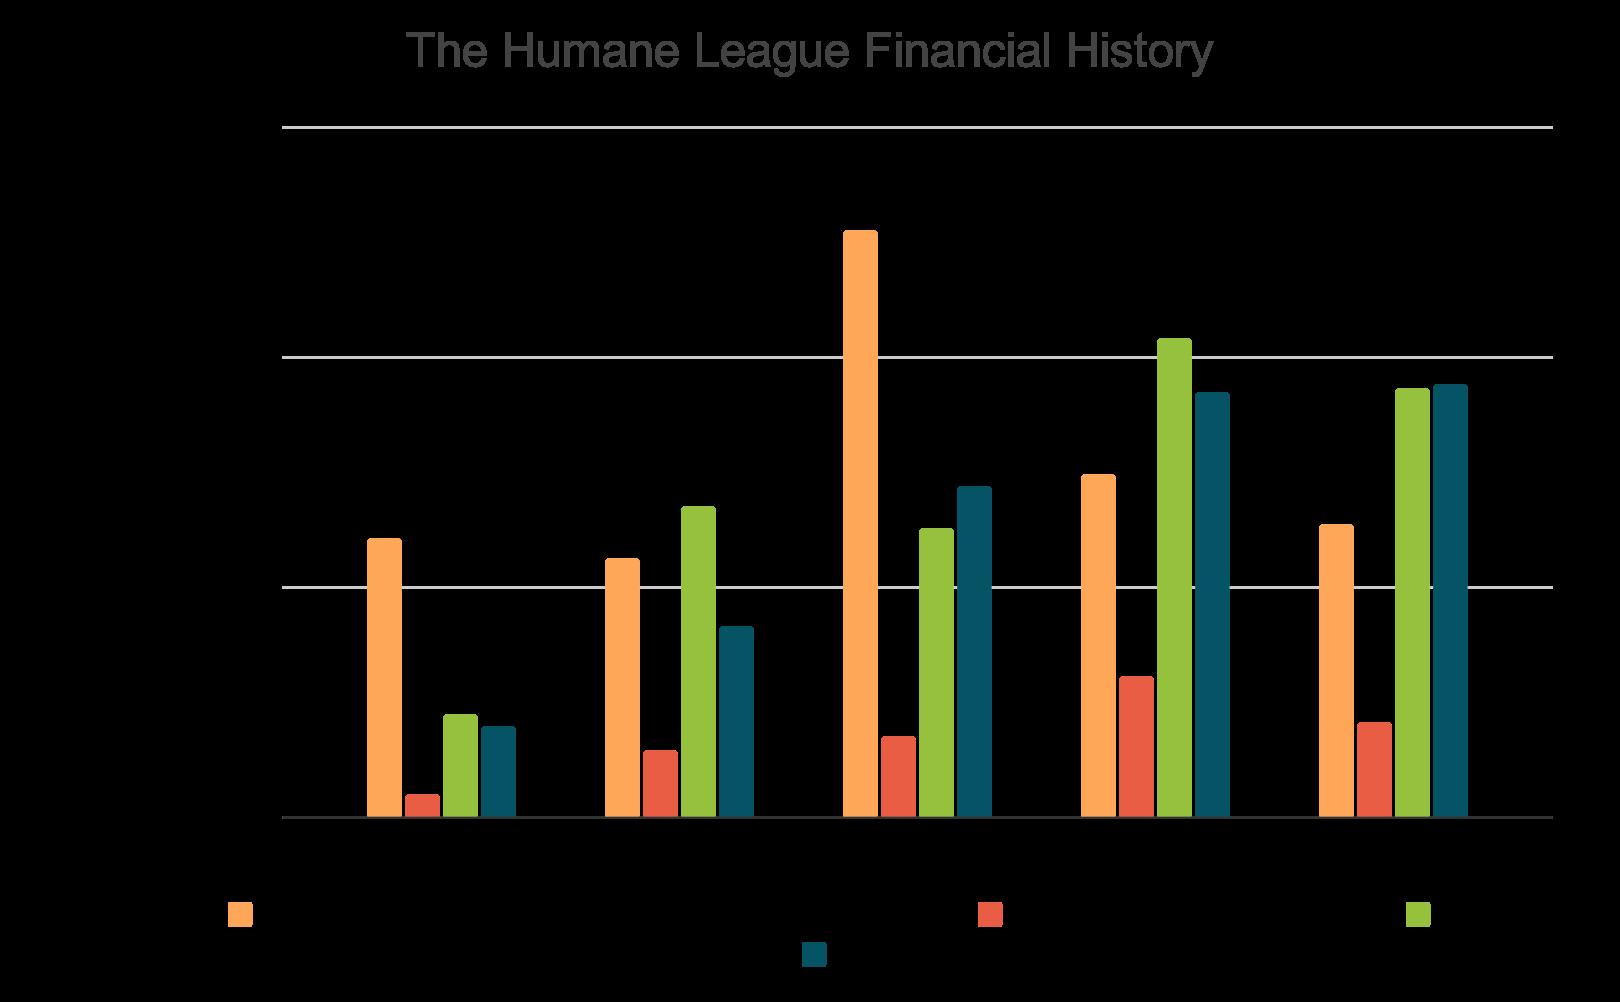 2020 THL Financial History